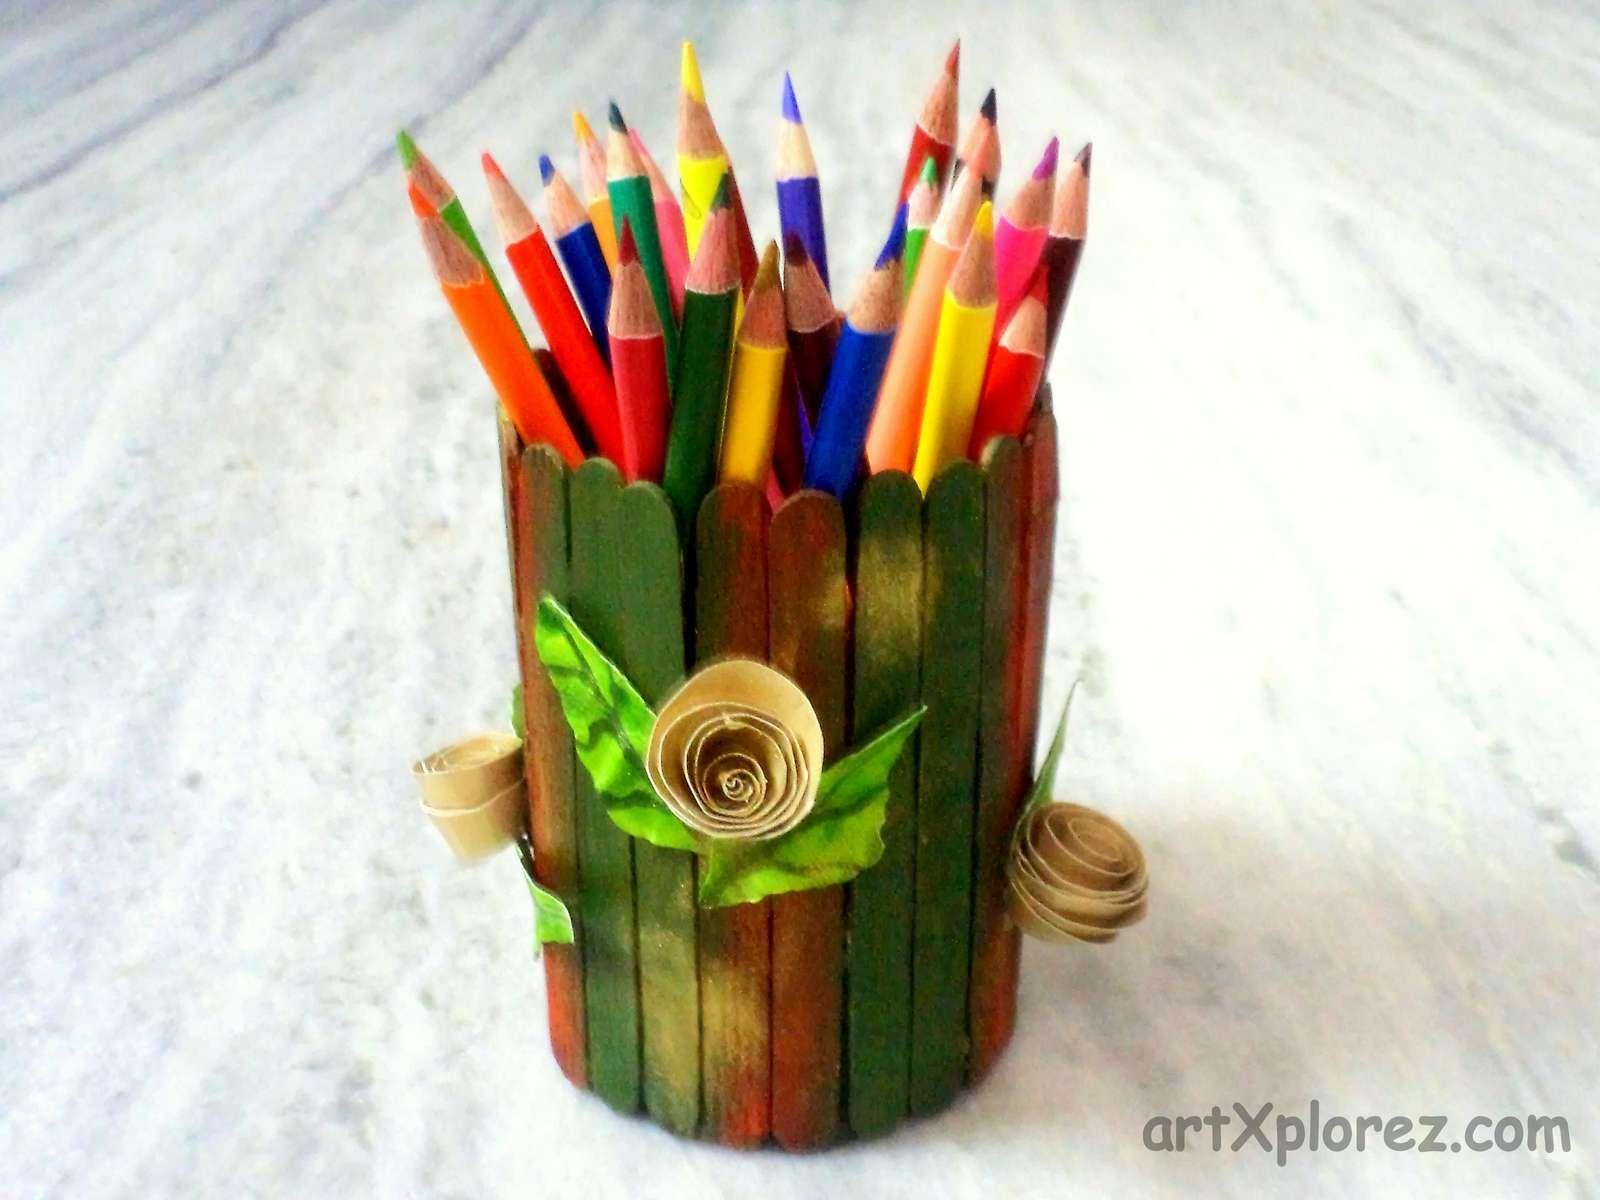 Ice Cream Stick Crafts - Ice Cream Stick Craft Puppet Making